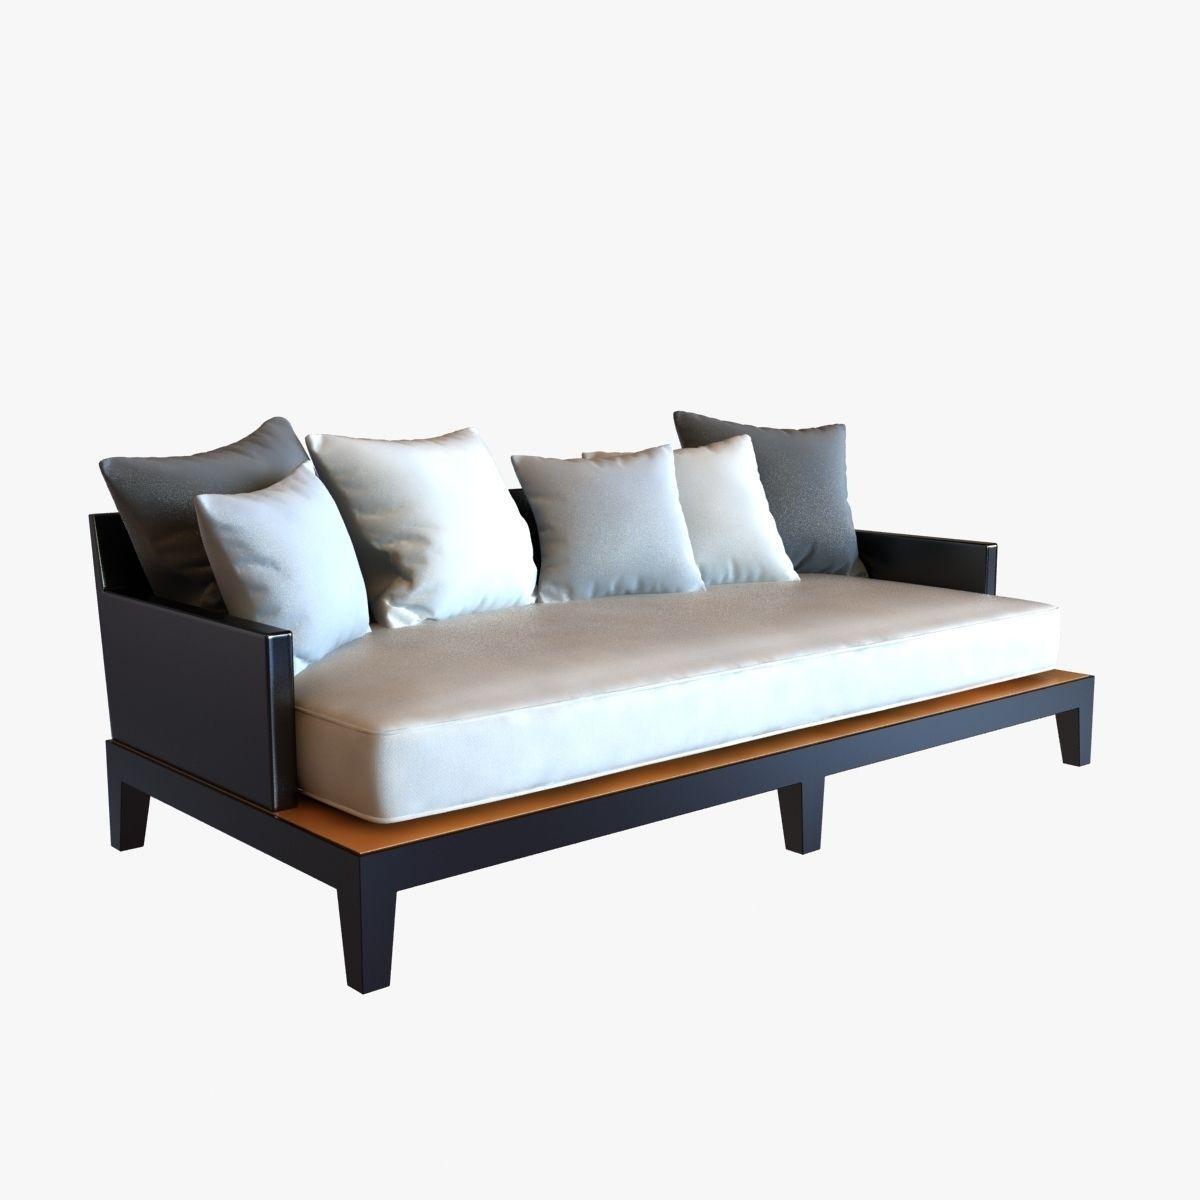 Christian liaigre sofa for holly hunt opium 3d model max for Divan furniture models